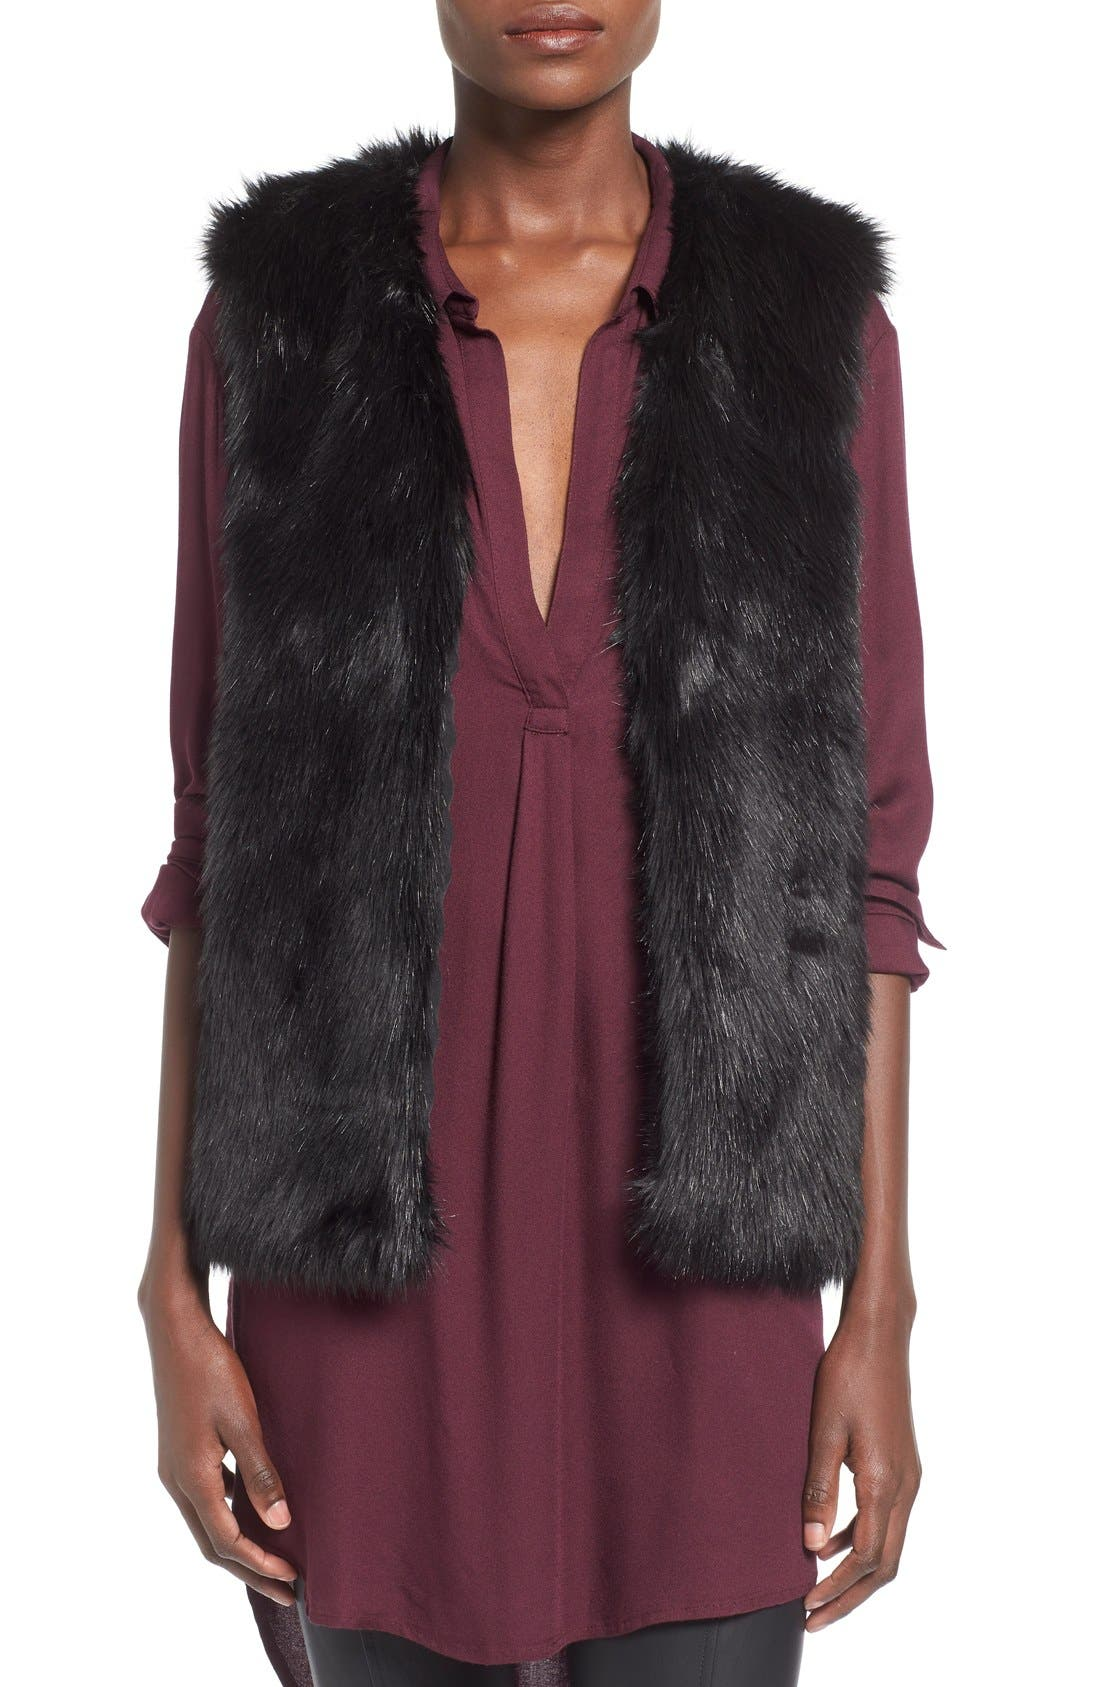 Alternate Image 1 Selected - WAYF Faux Fur Vest